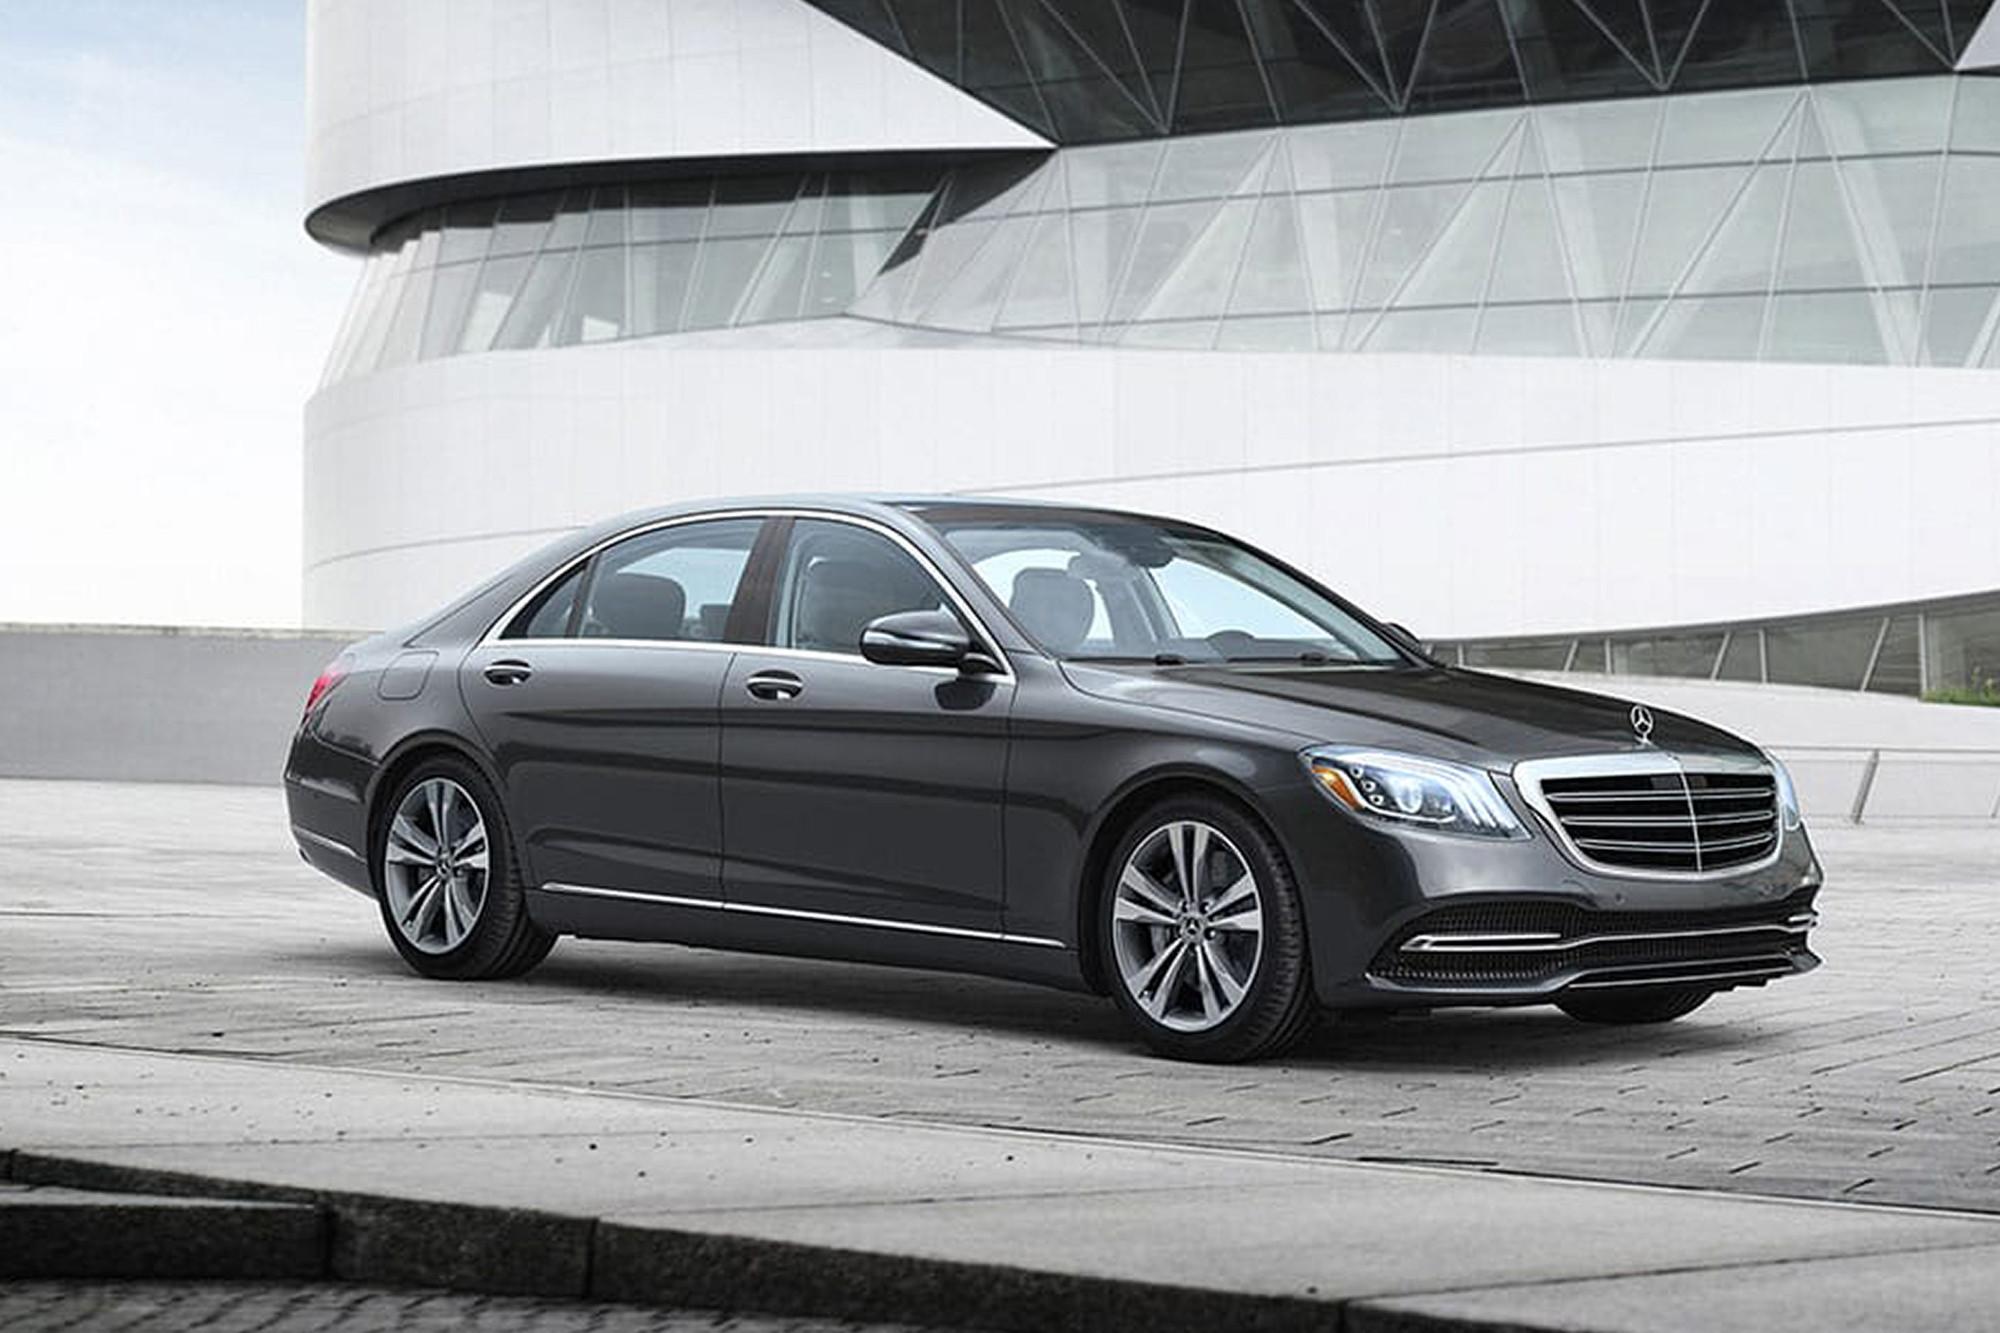 mercedes-benz-s-class-2020-01-angle--black--exterior--front--urban.jpg